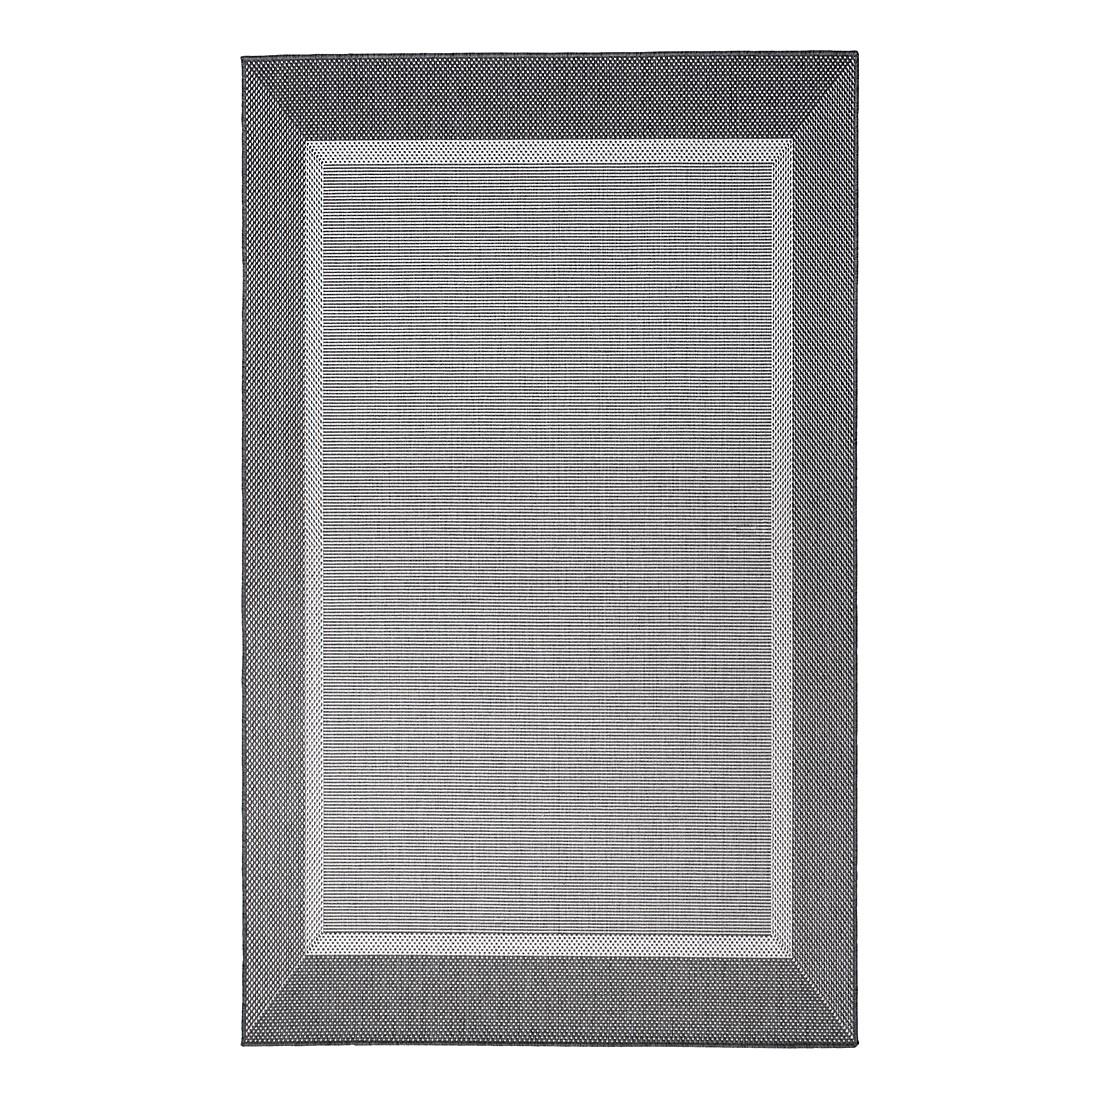 teppich carpetto iv silber 200 x 290 cm astra g nstig bestellen. Black Bedroom Furniture Sets. Home Design Ideas